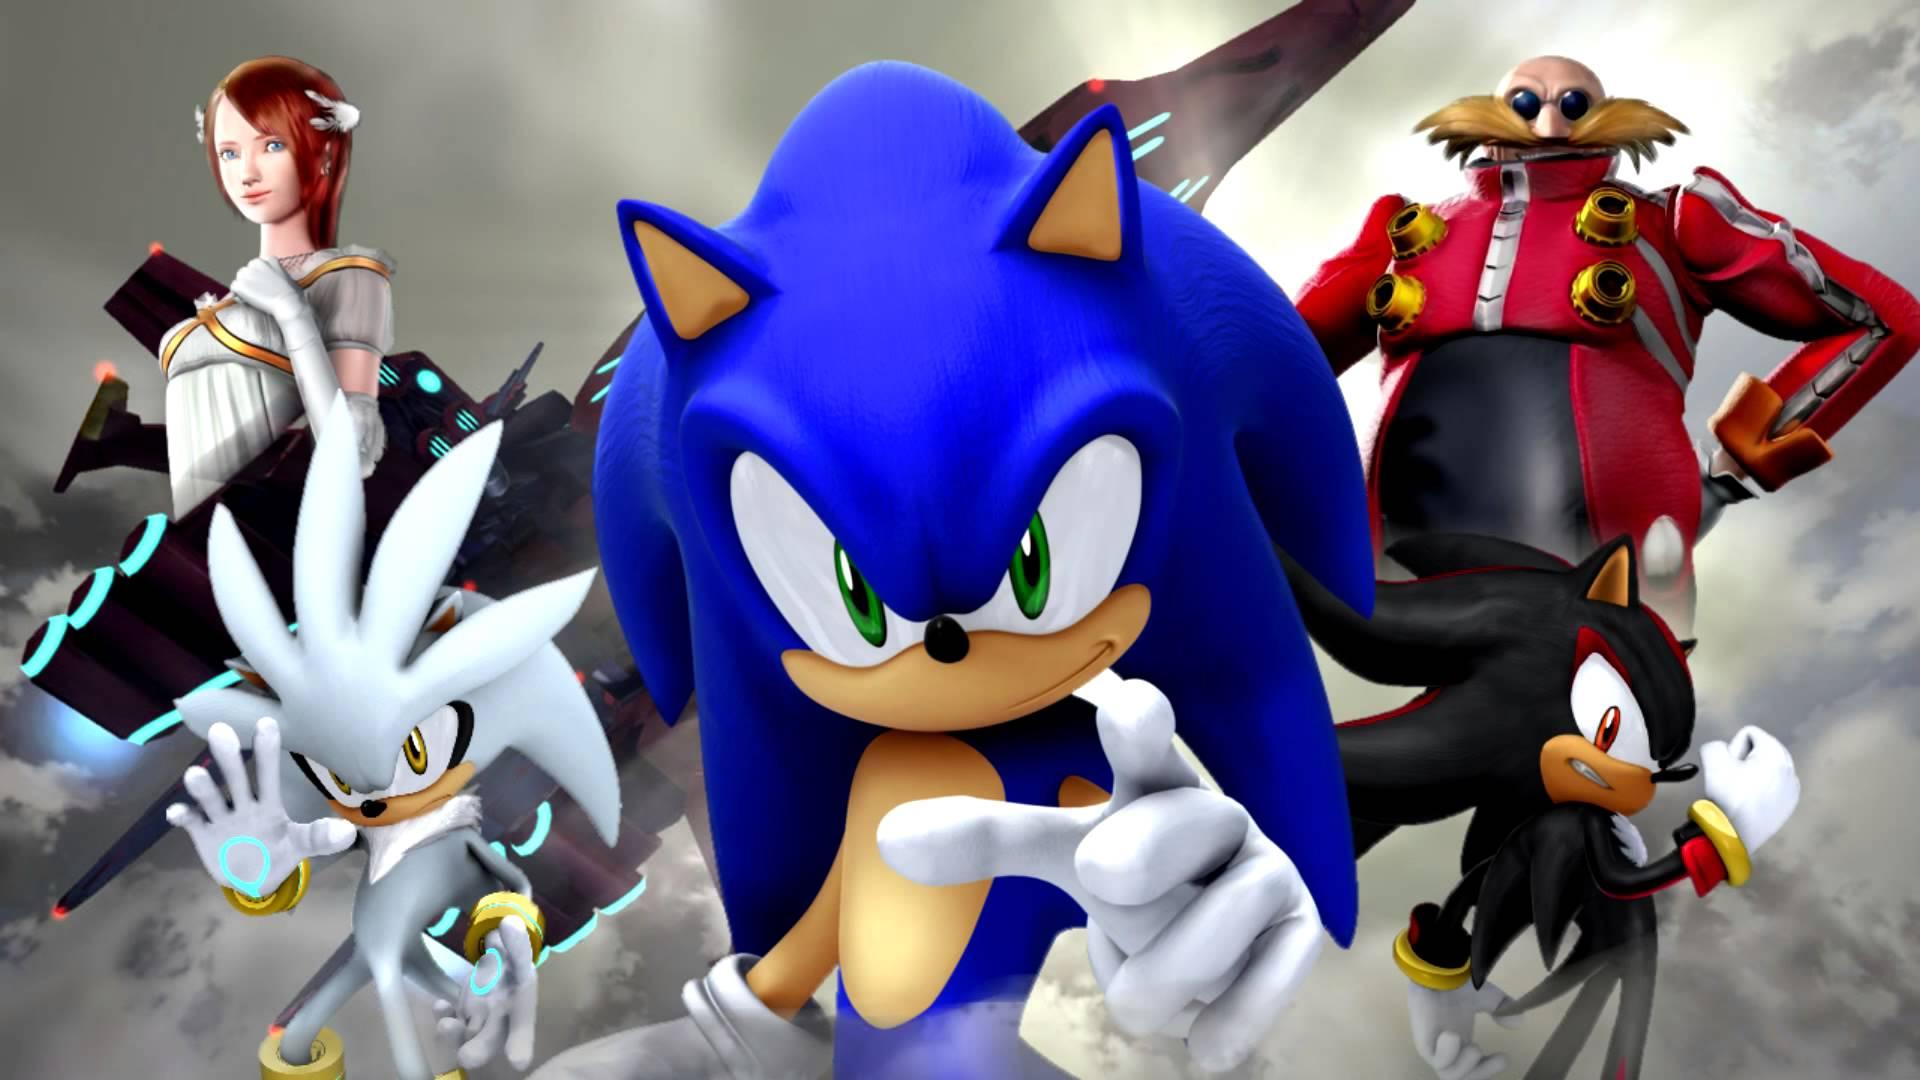 Sonic 2006, ah que saudades ¬¬